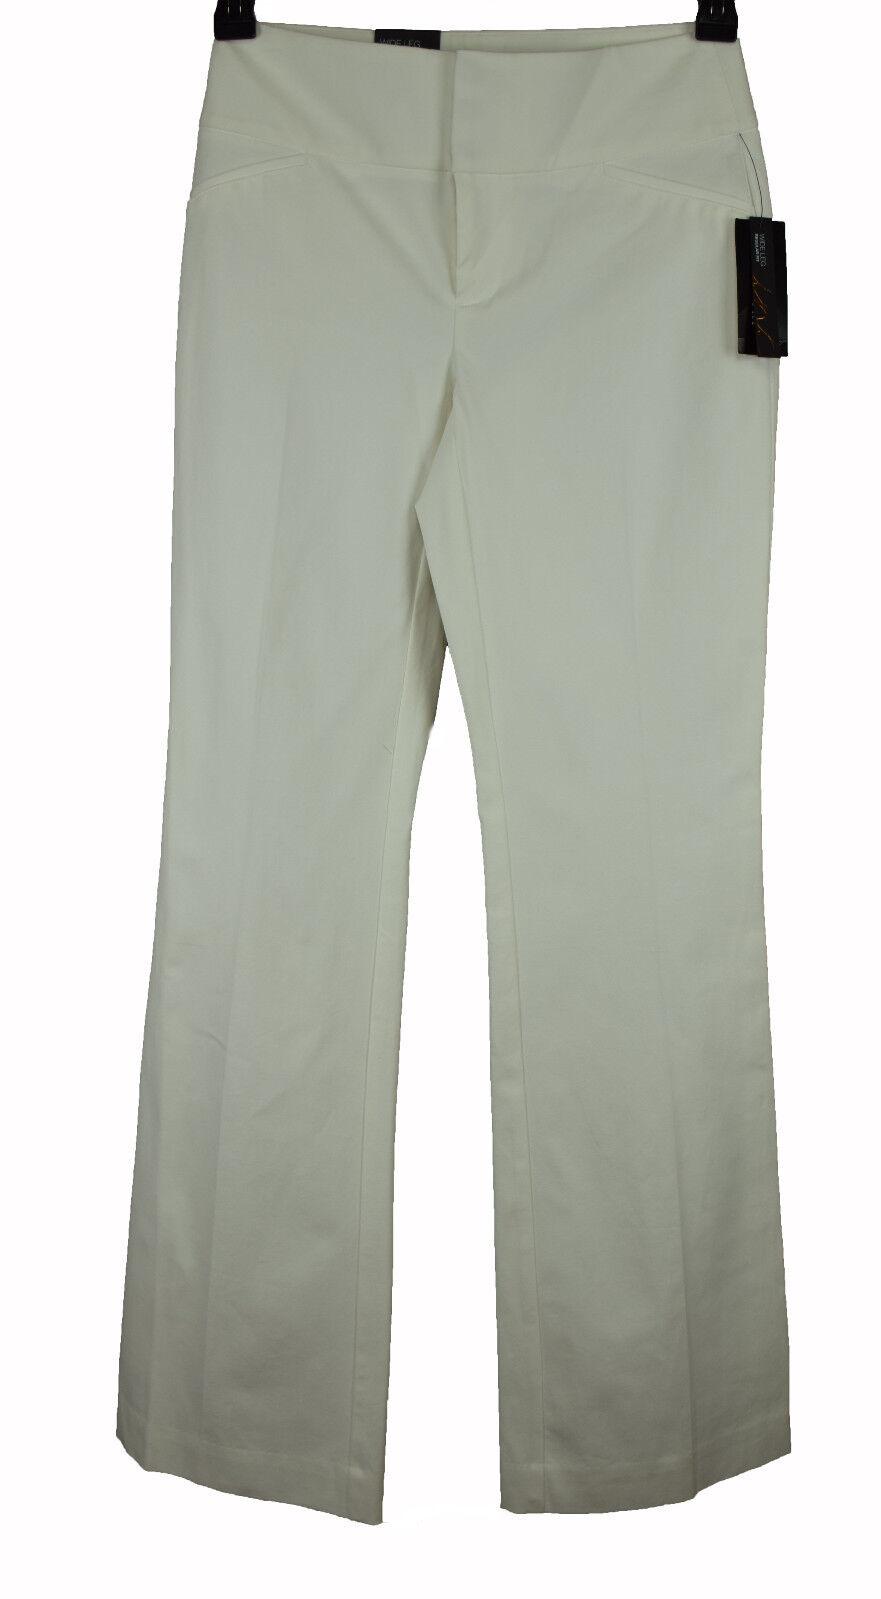 INC Womens White Wide Leg Regular Fit Trousers Pants 6 8 10 16